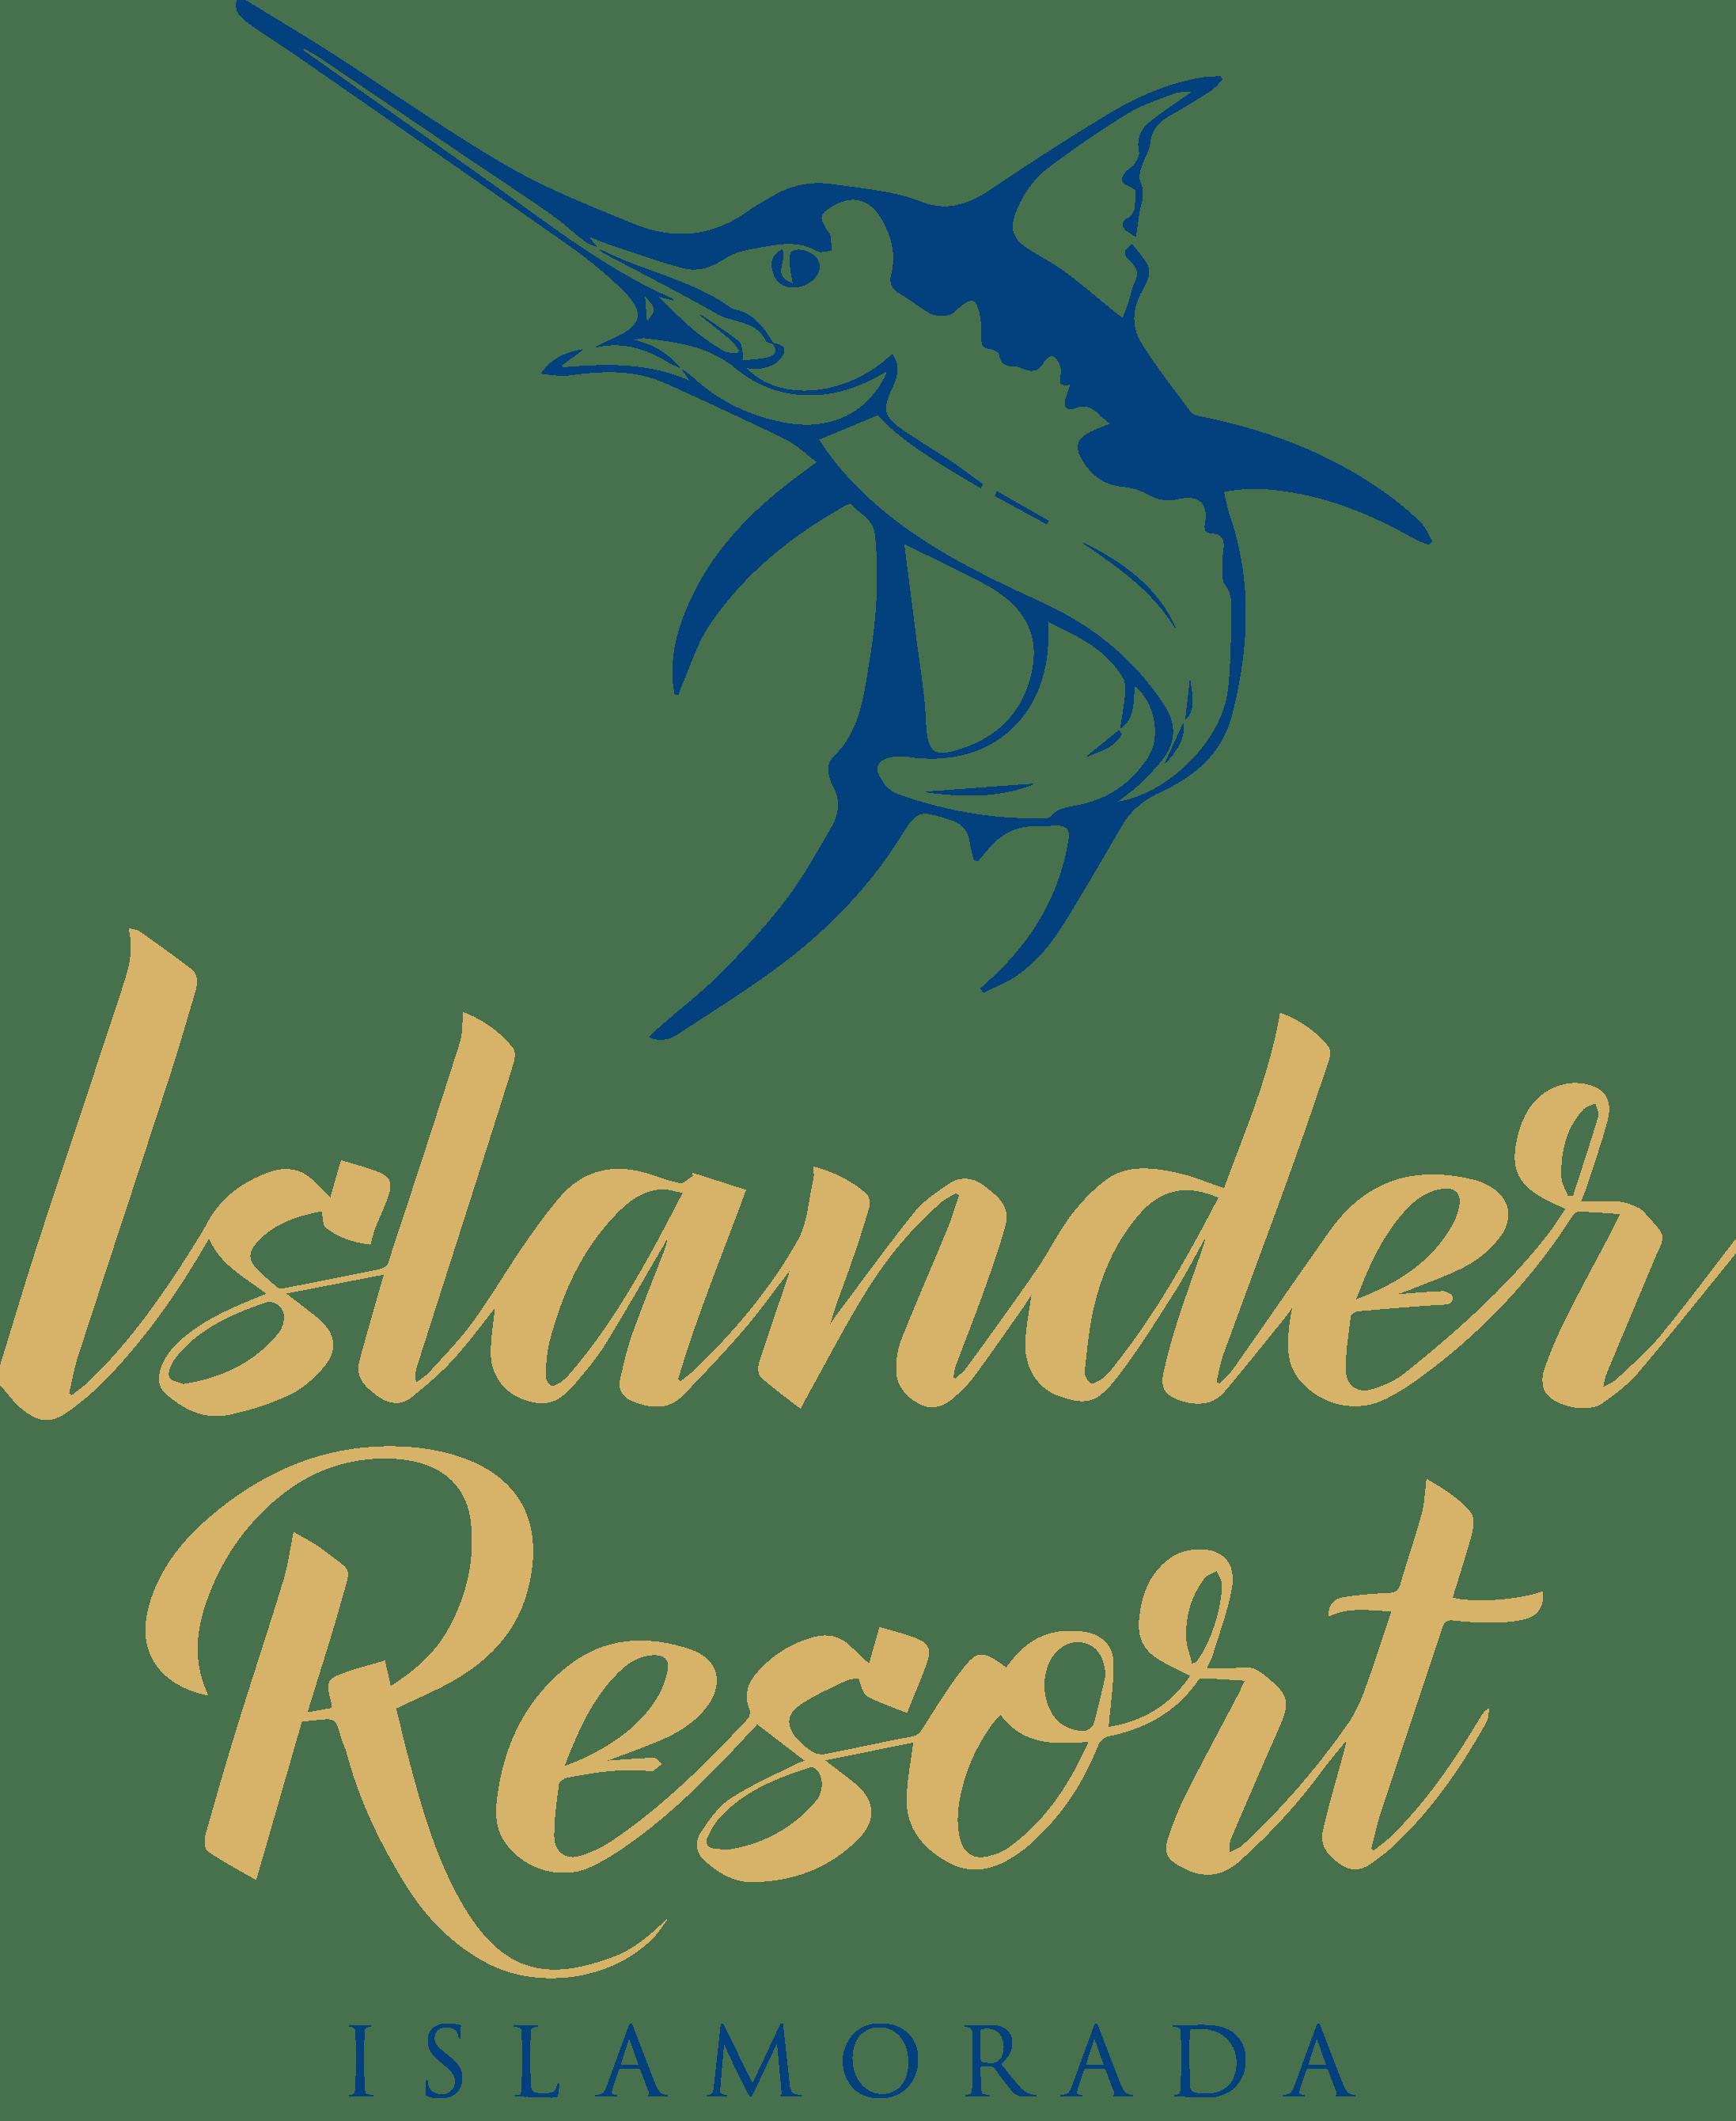 Islander Resort, Islamorada Logo